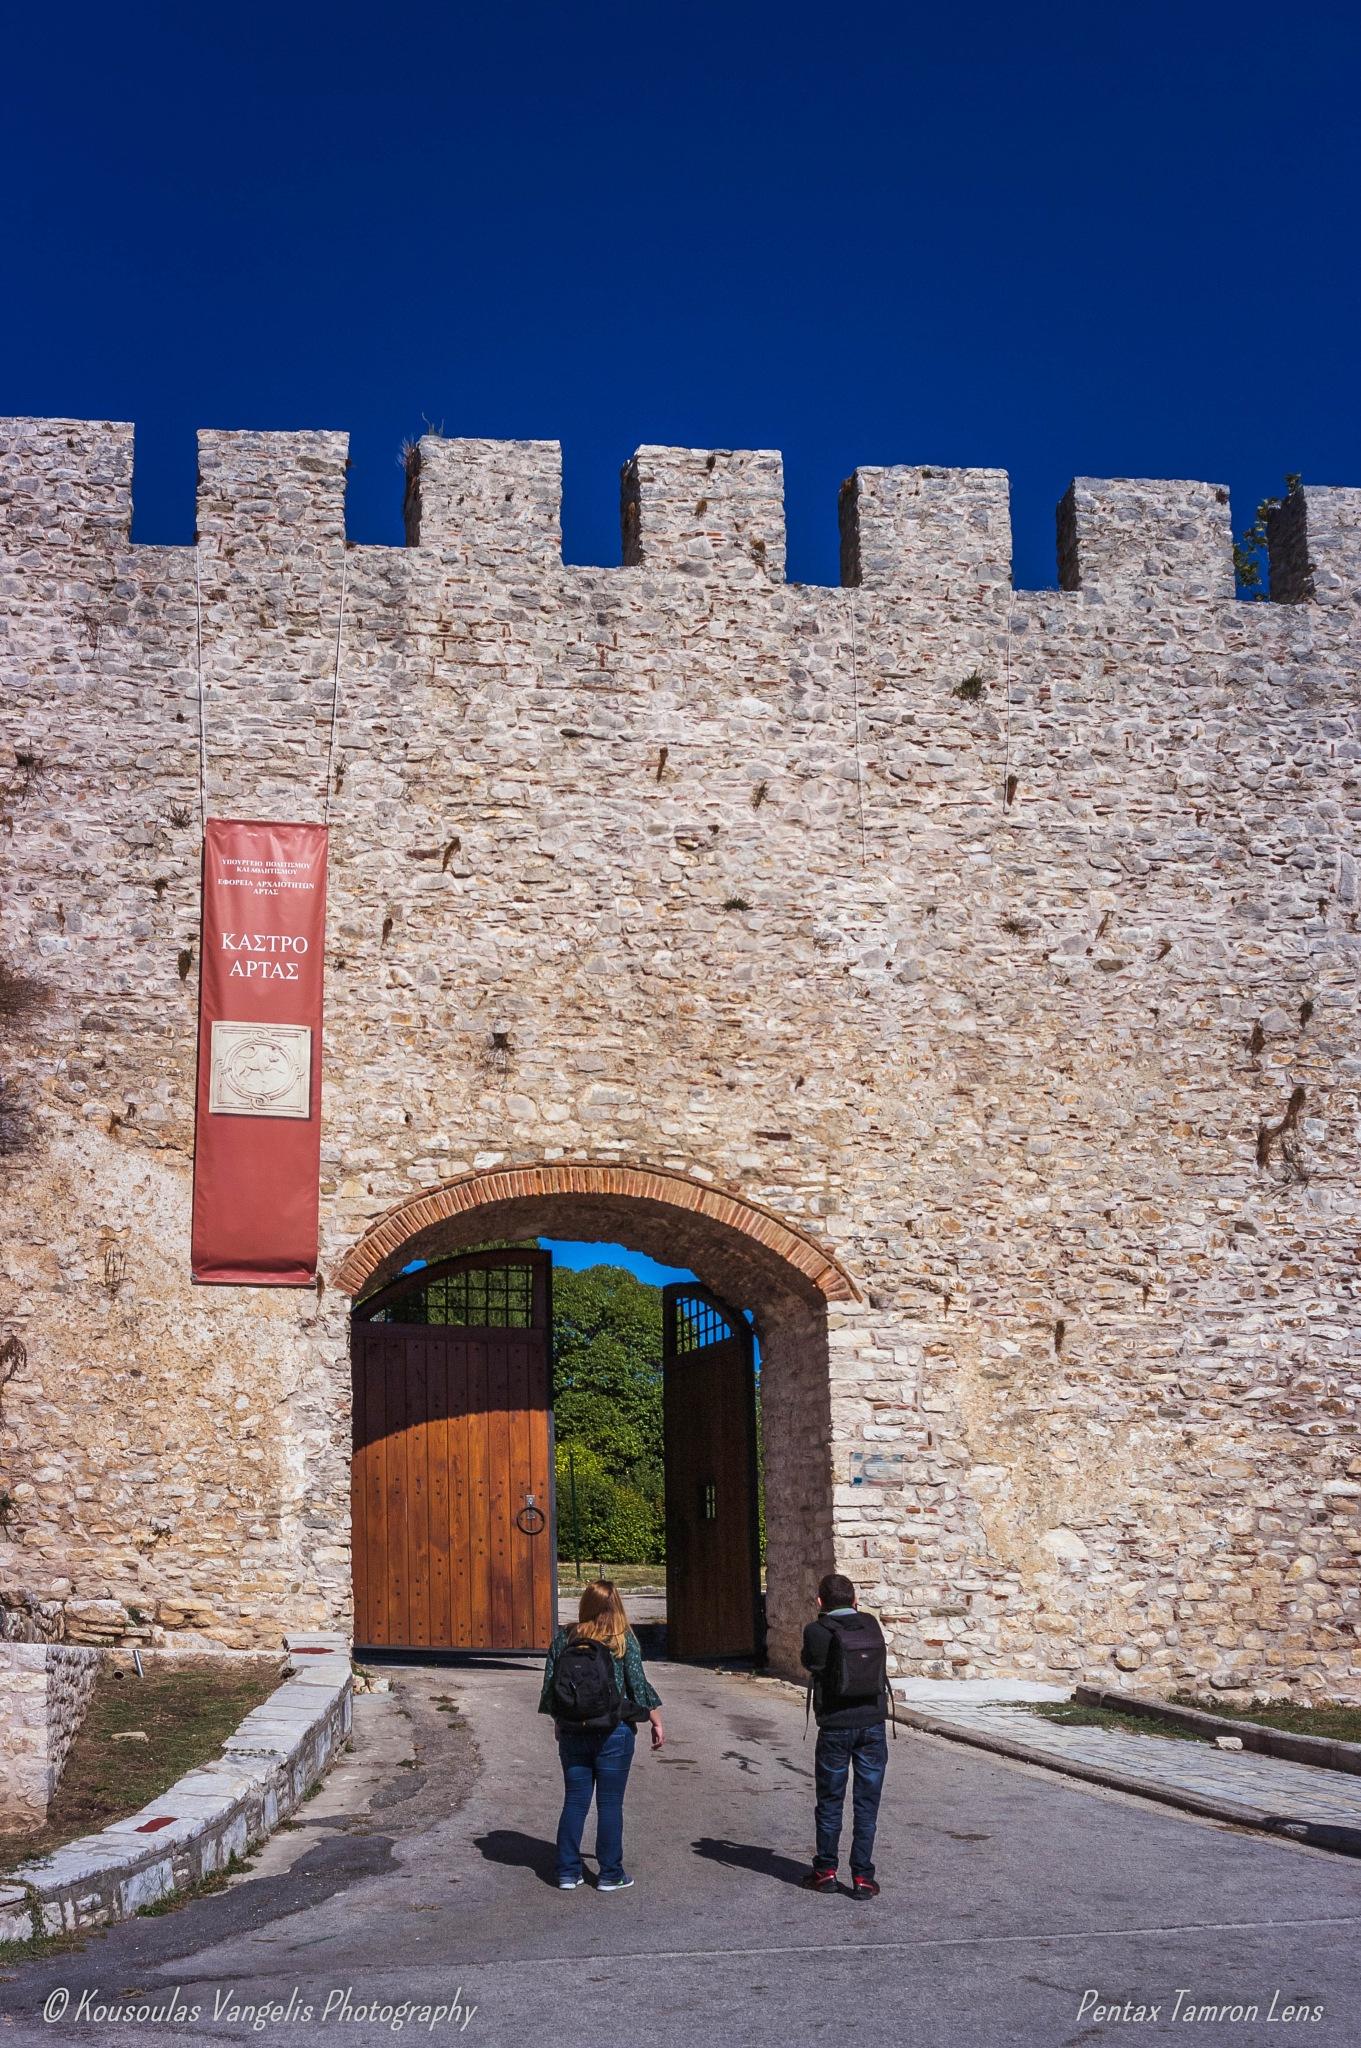 the Castle of Arta by kousoulas vangelis